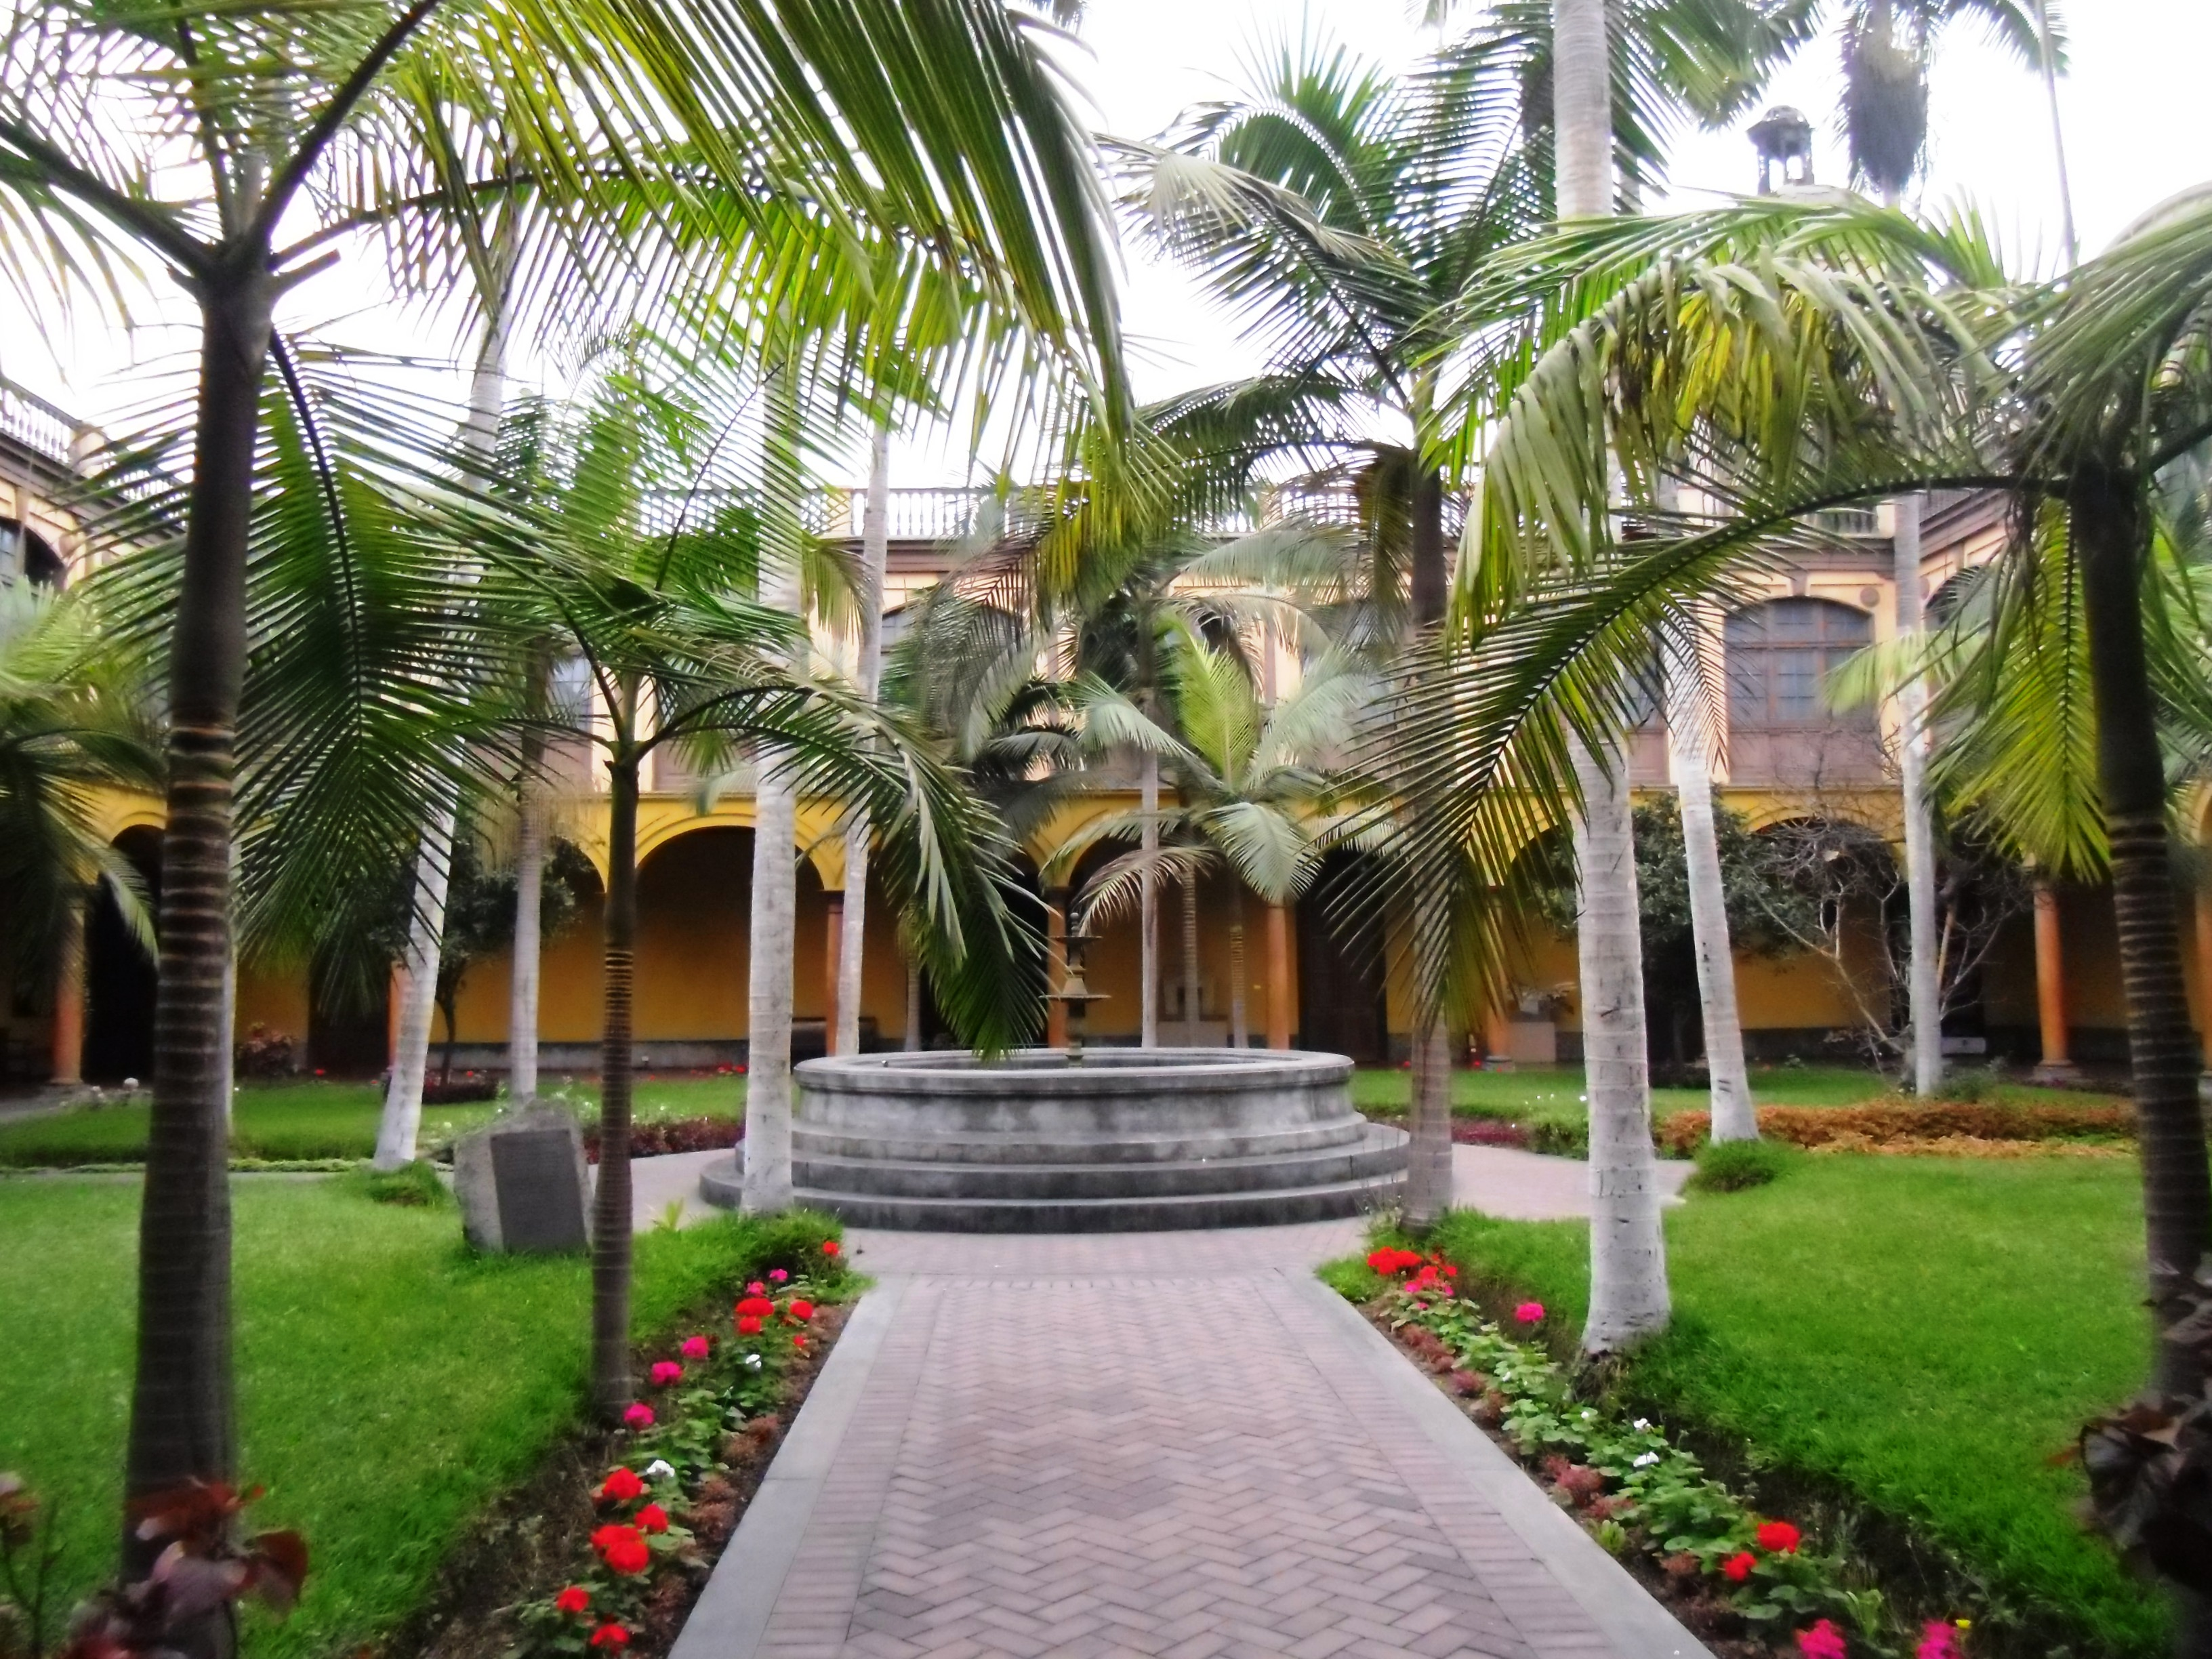 File:Patio de Letras-Casona de San Marcos 2.jpg - Wikimedia Commons